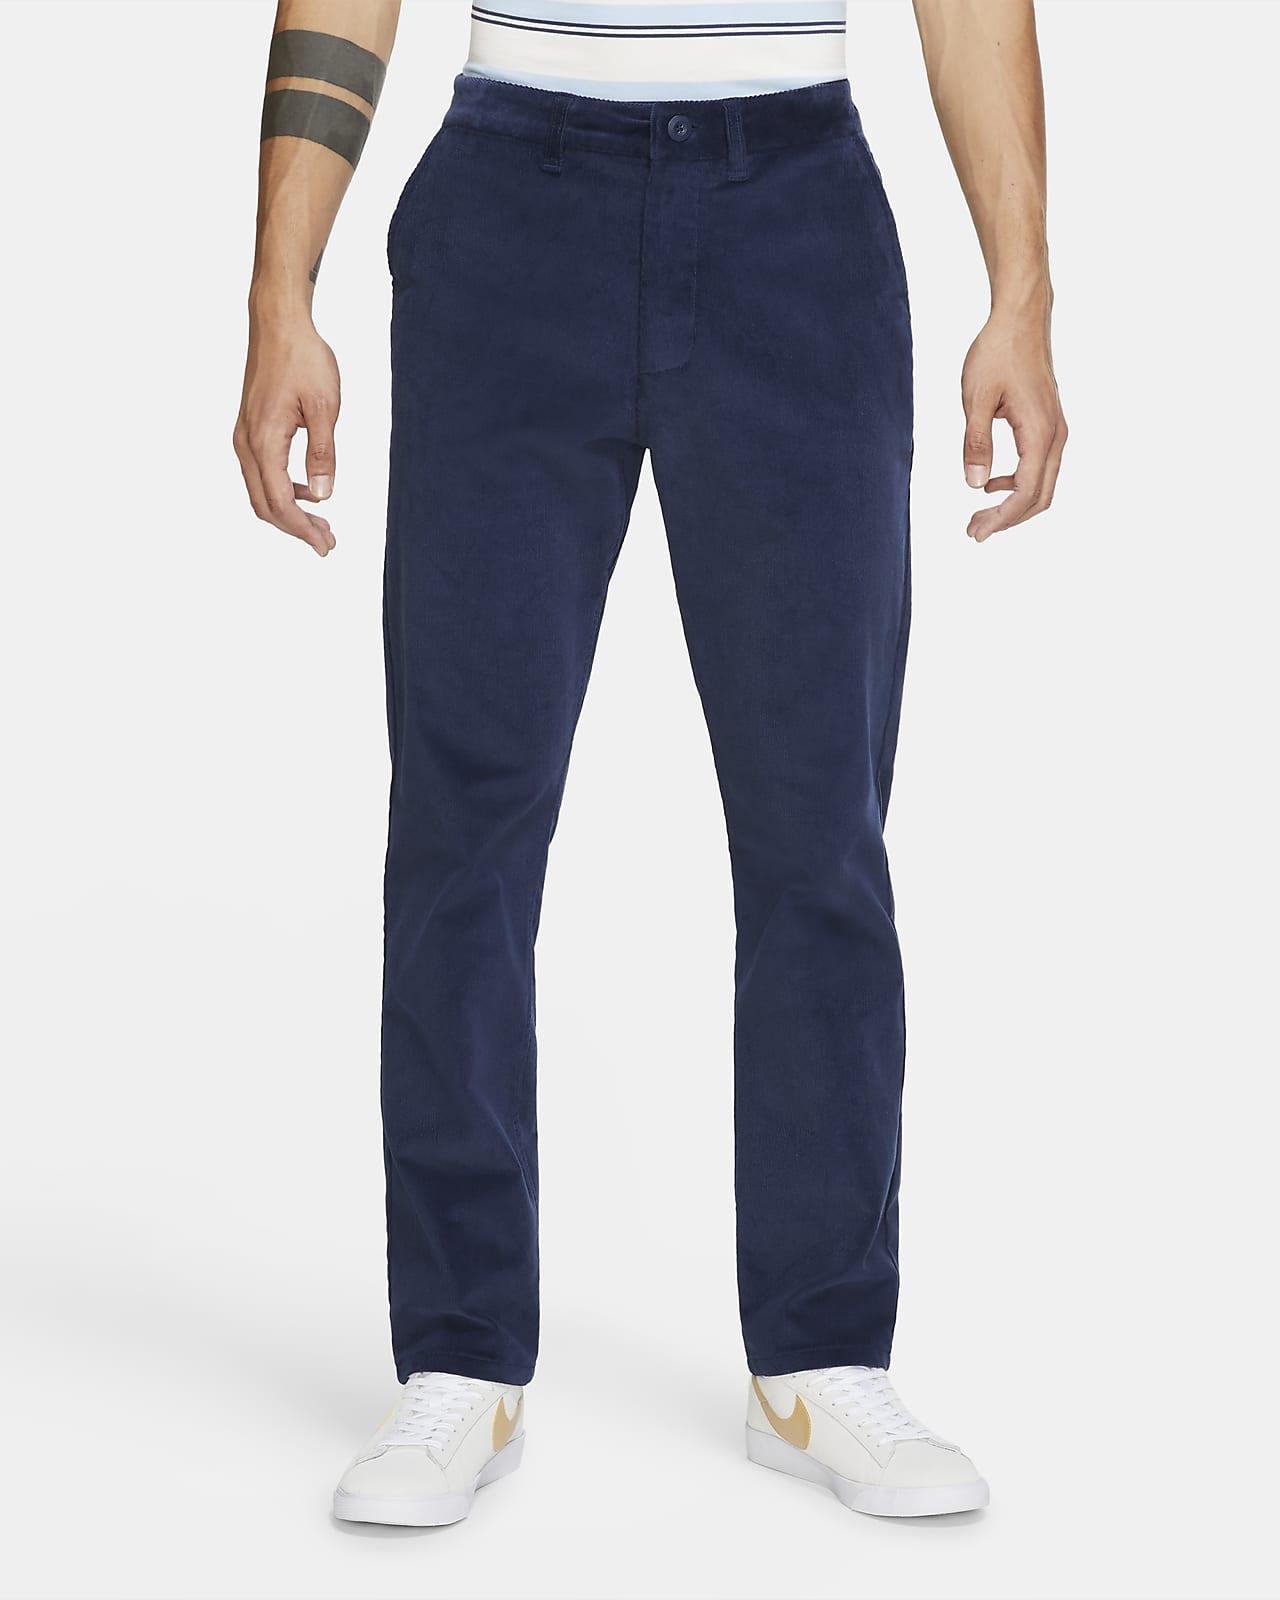 Nike SB Men's Corduroy Skate Trousers